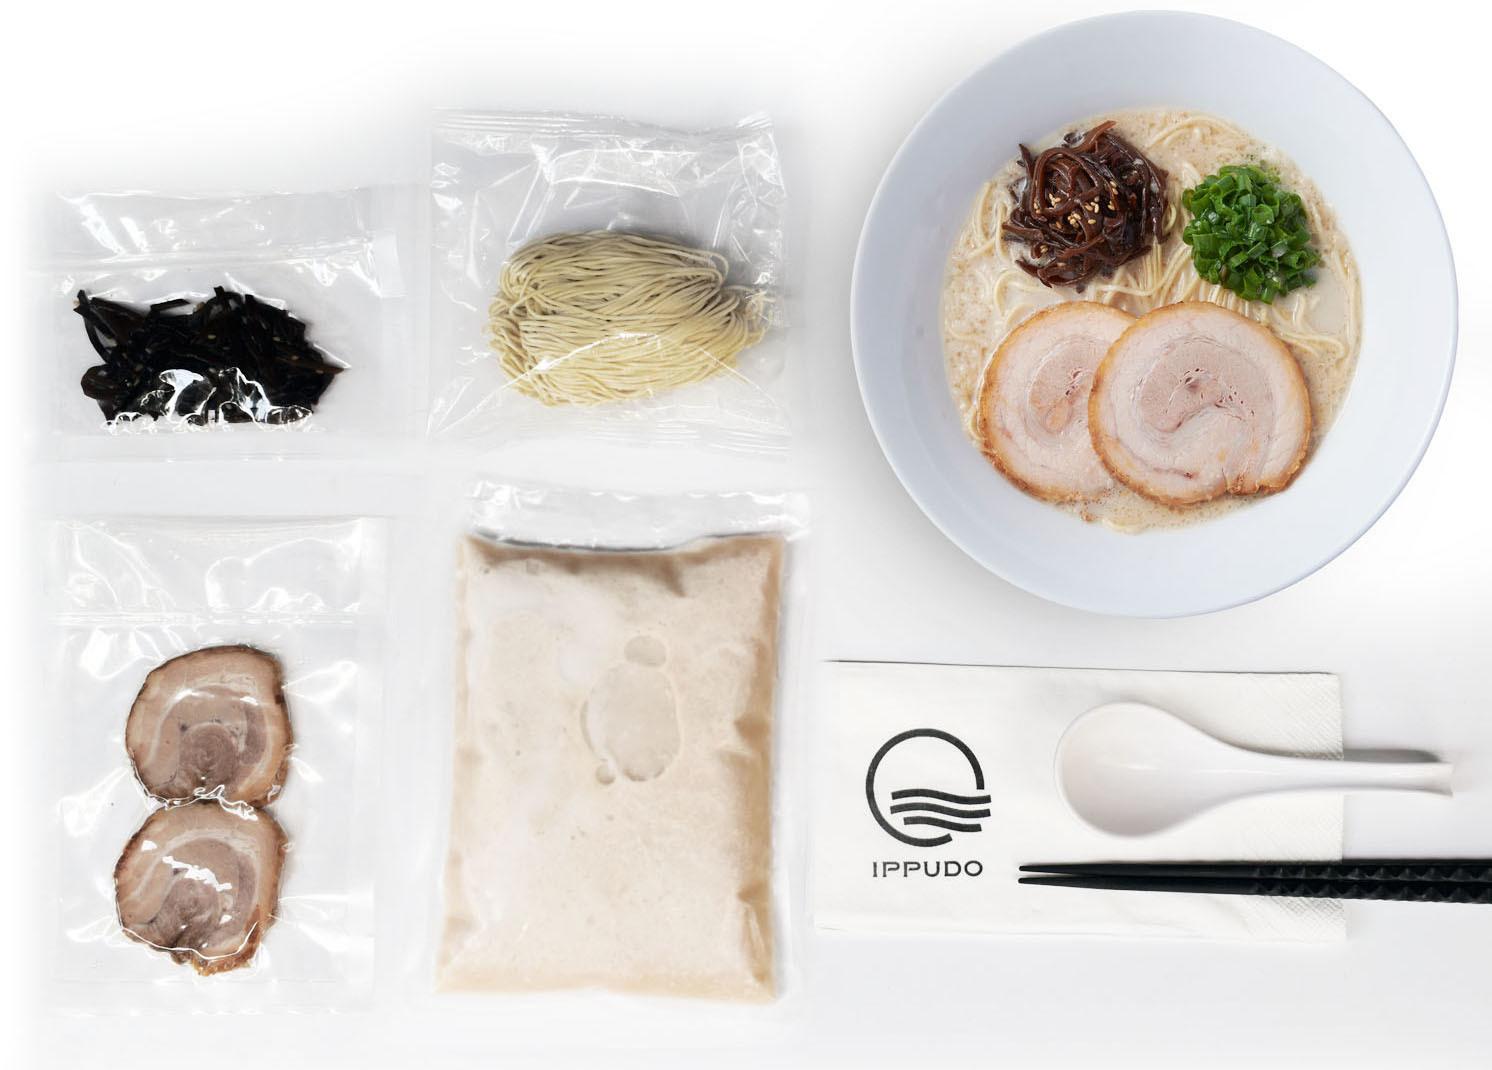 Ippudo DIY ramen meal kit